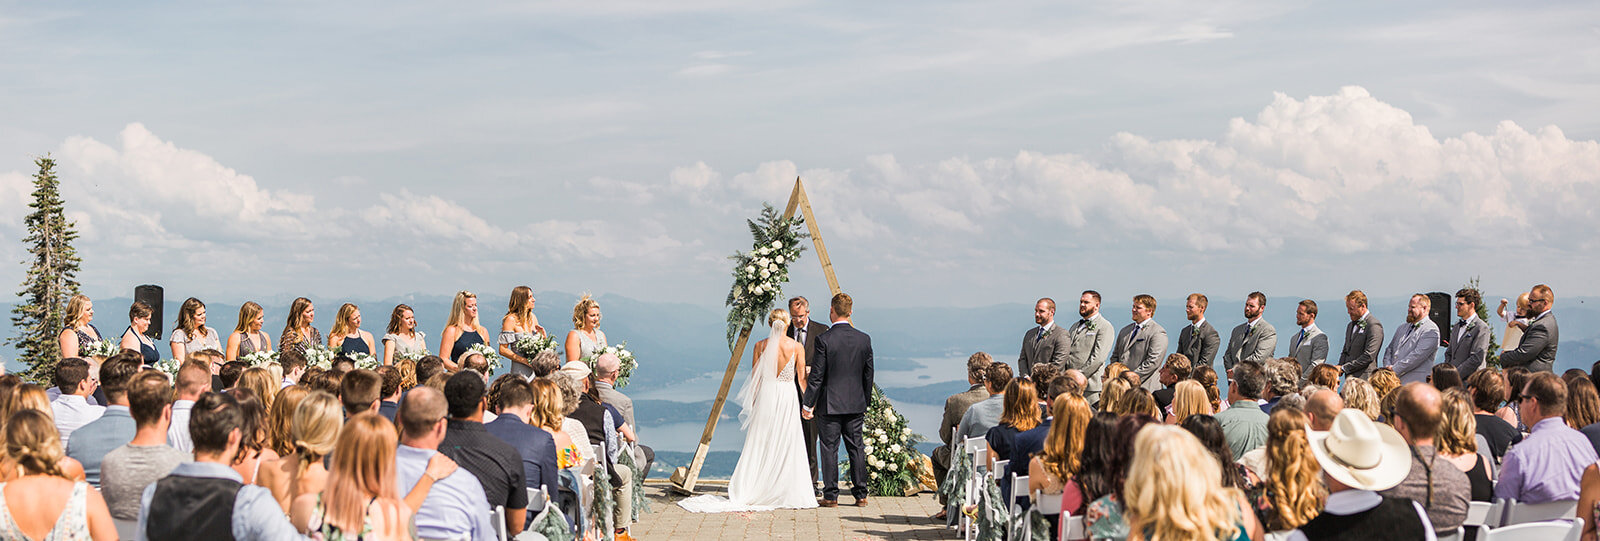 bride and groom with wedding party spokane ceremony